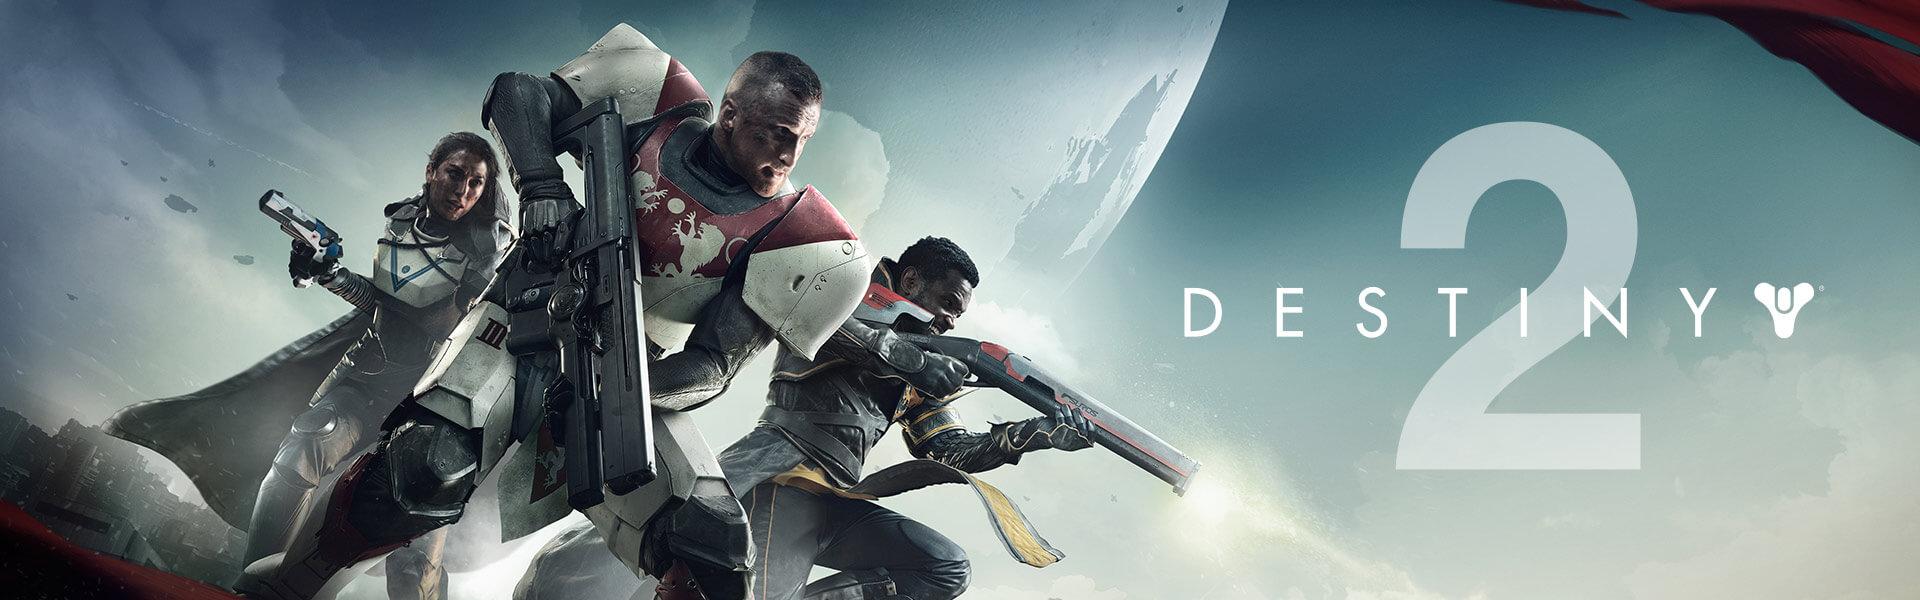 destiny-2-pc-banner